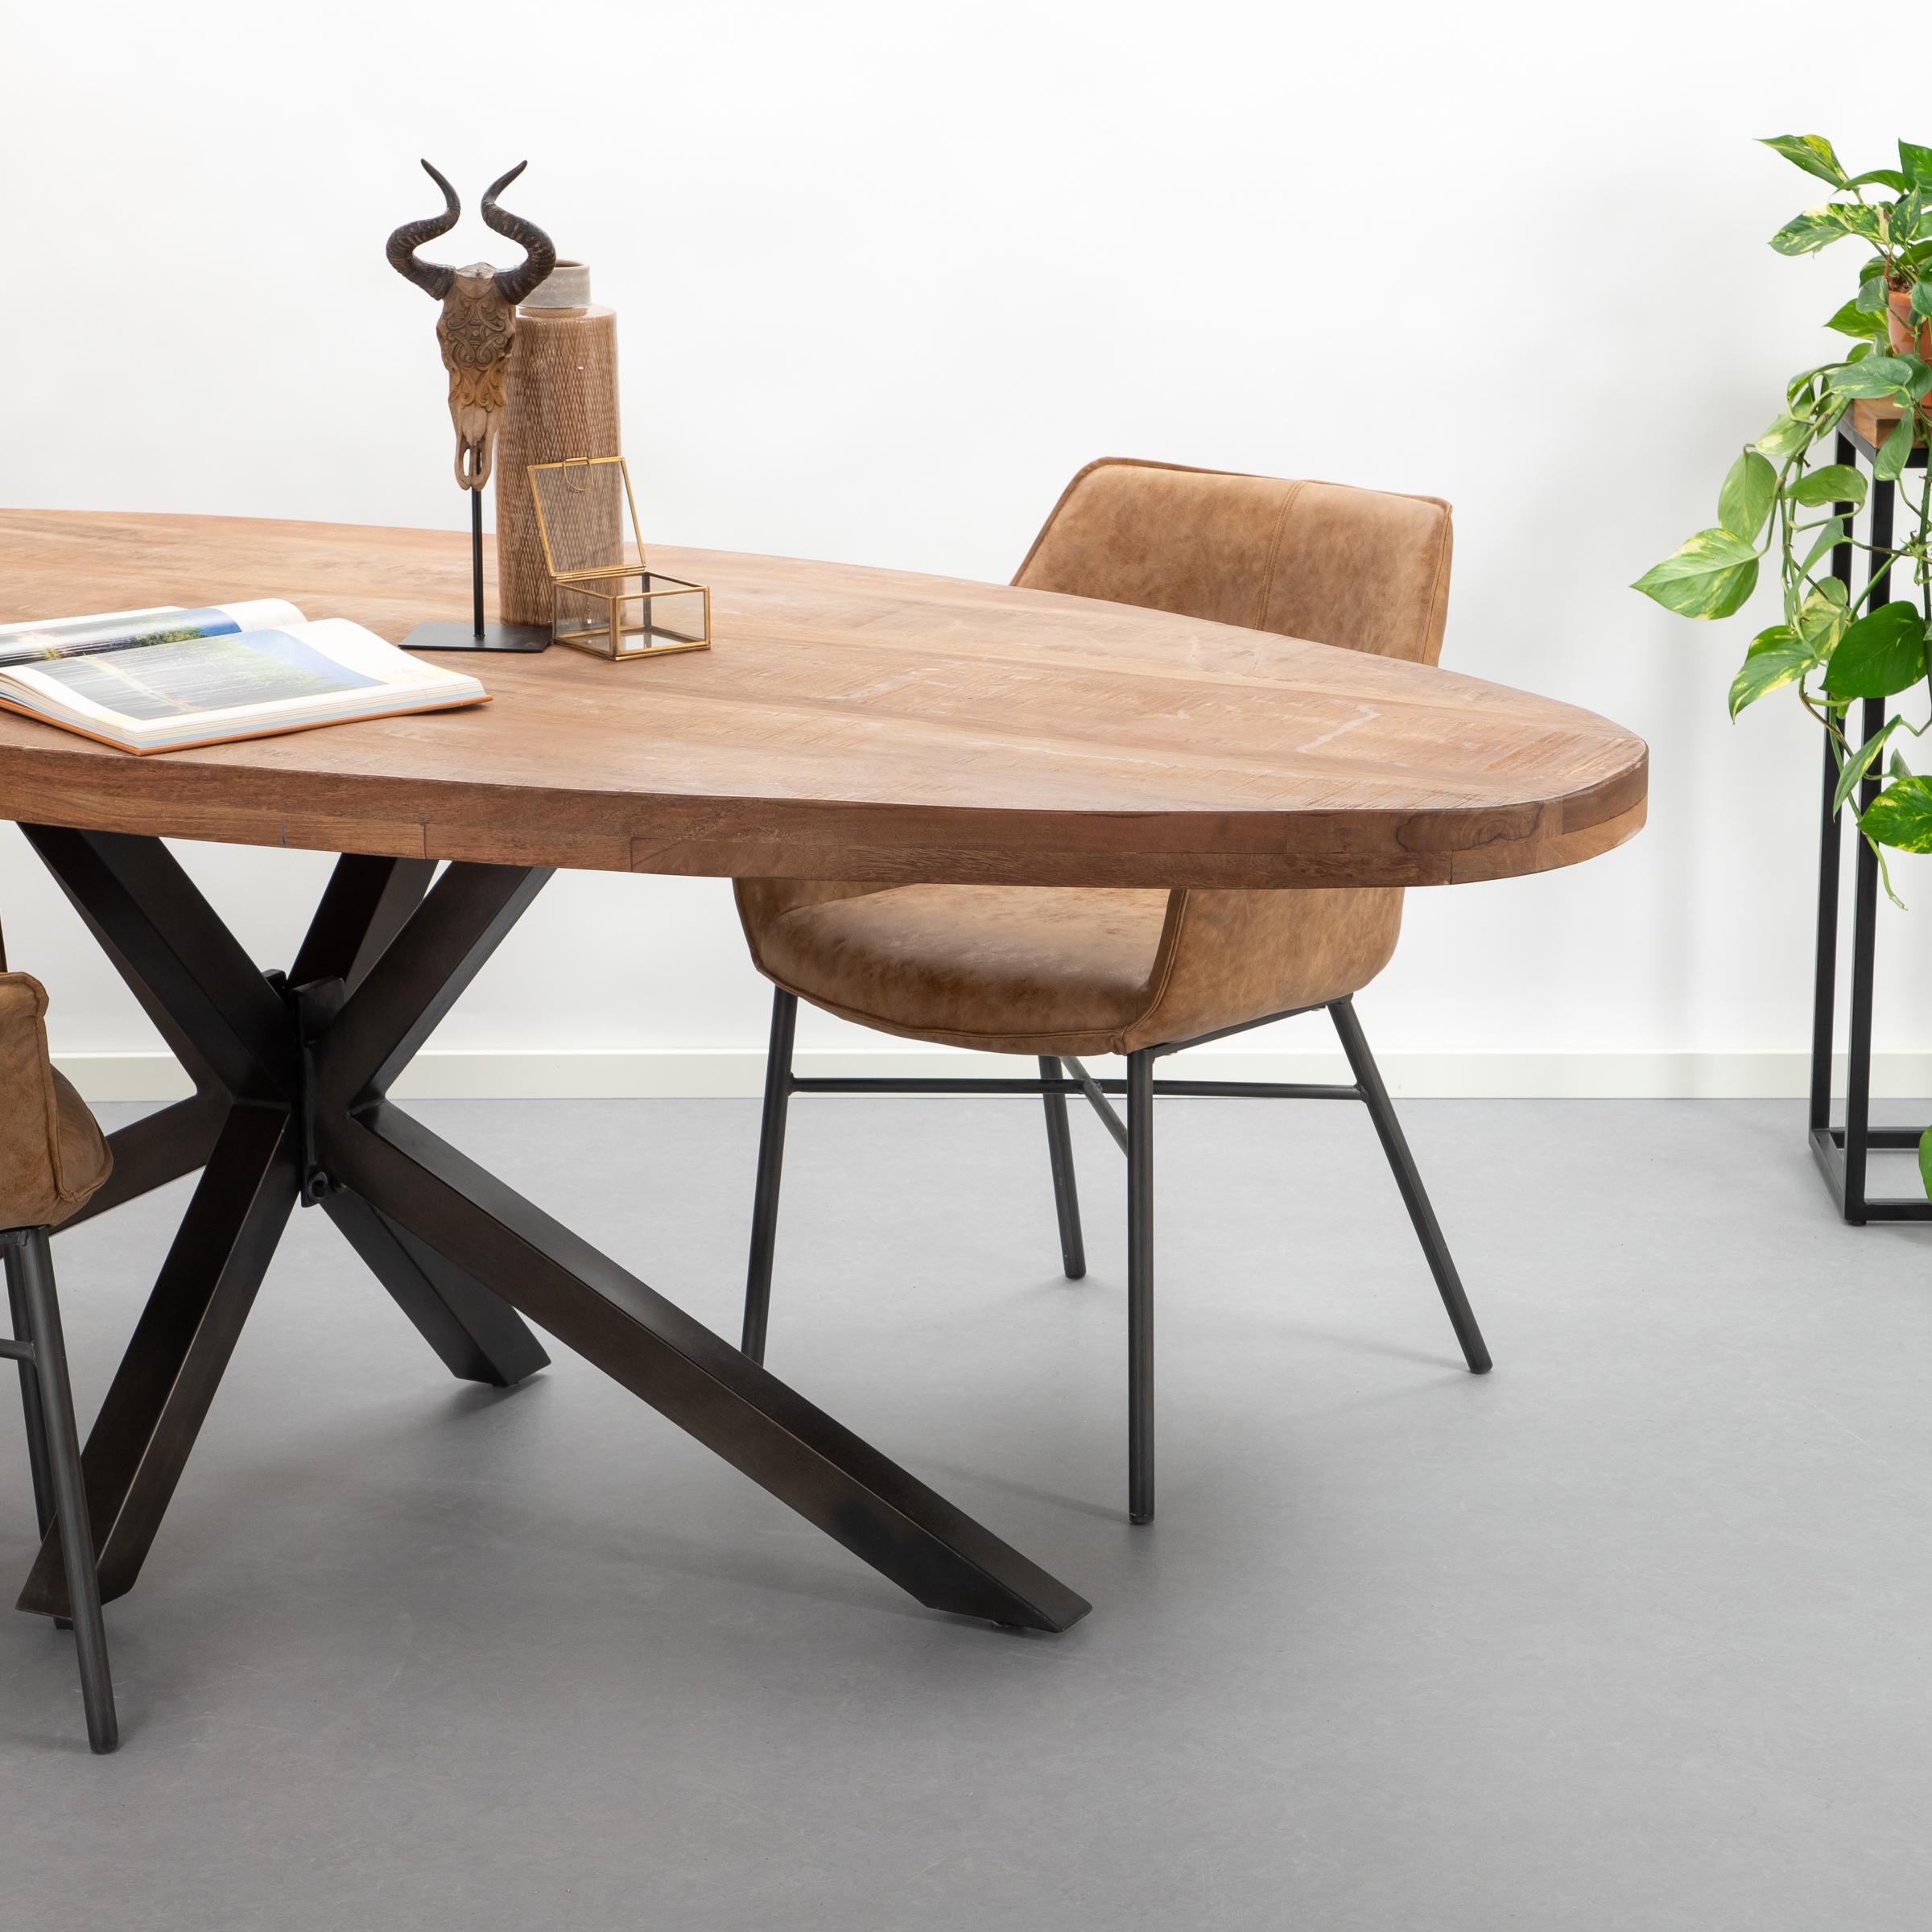 Eleonora Ovale Eettafel 'Mango Industrieel' 240 x 100cm